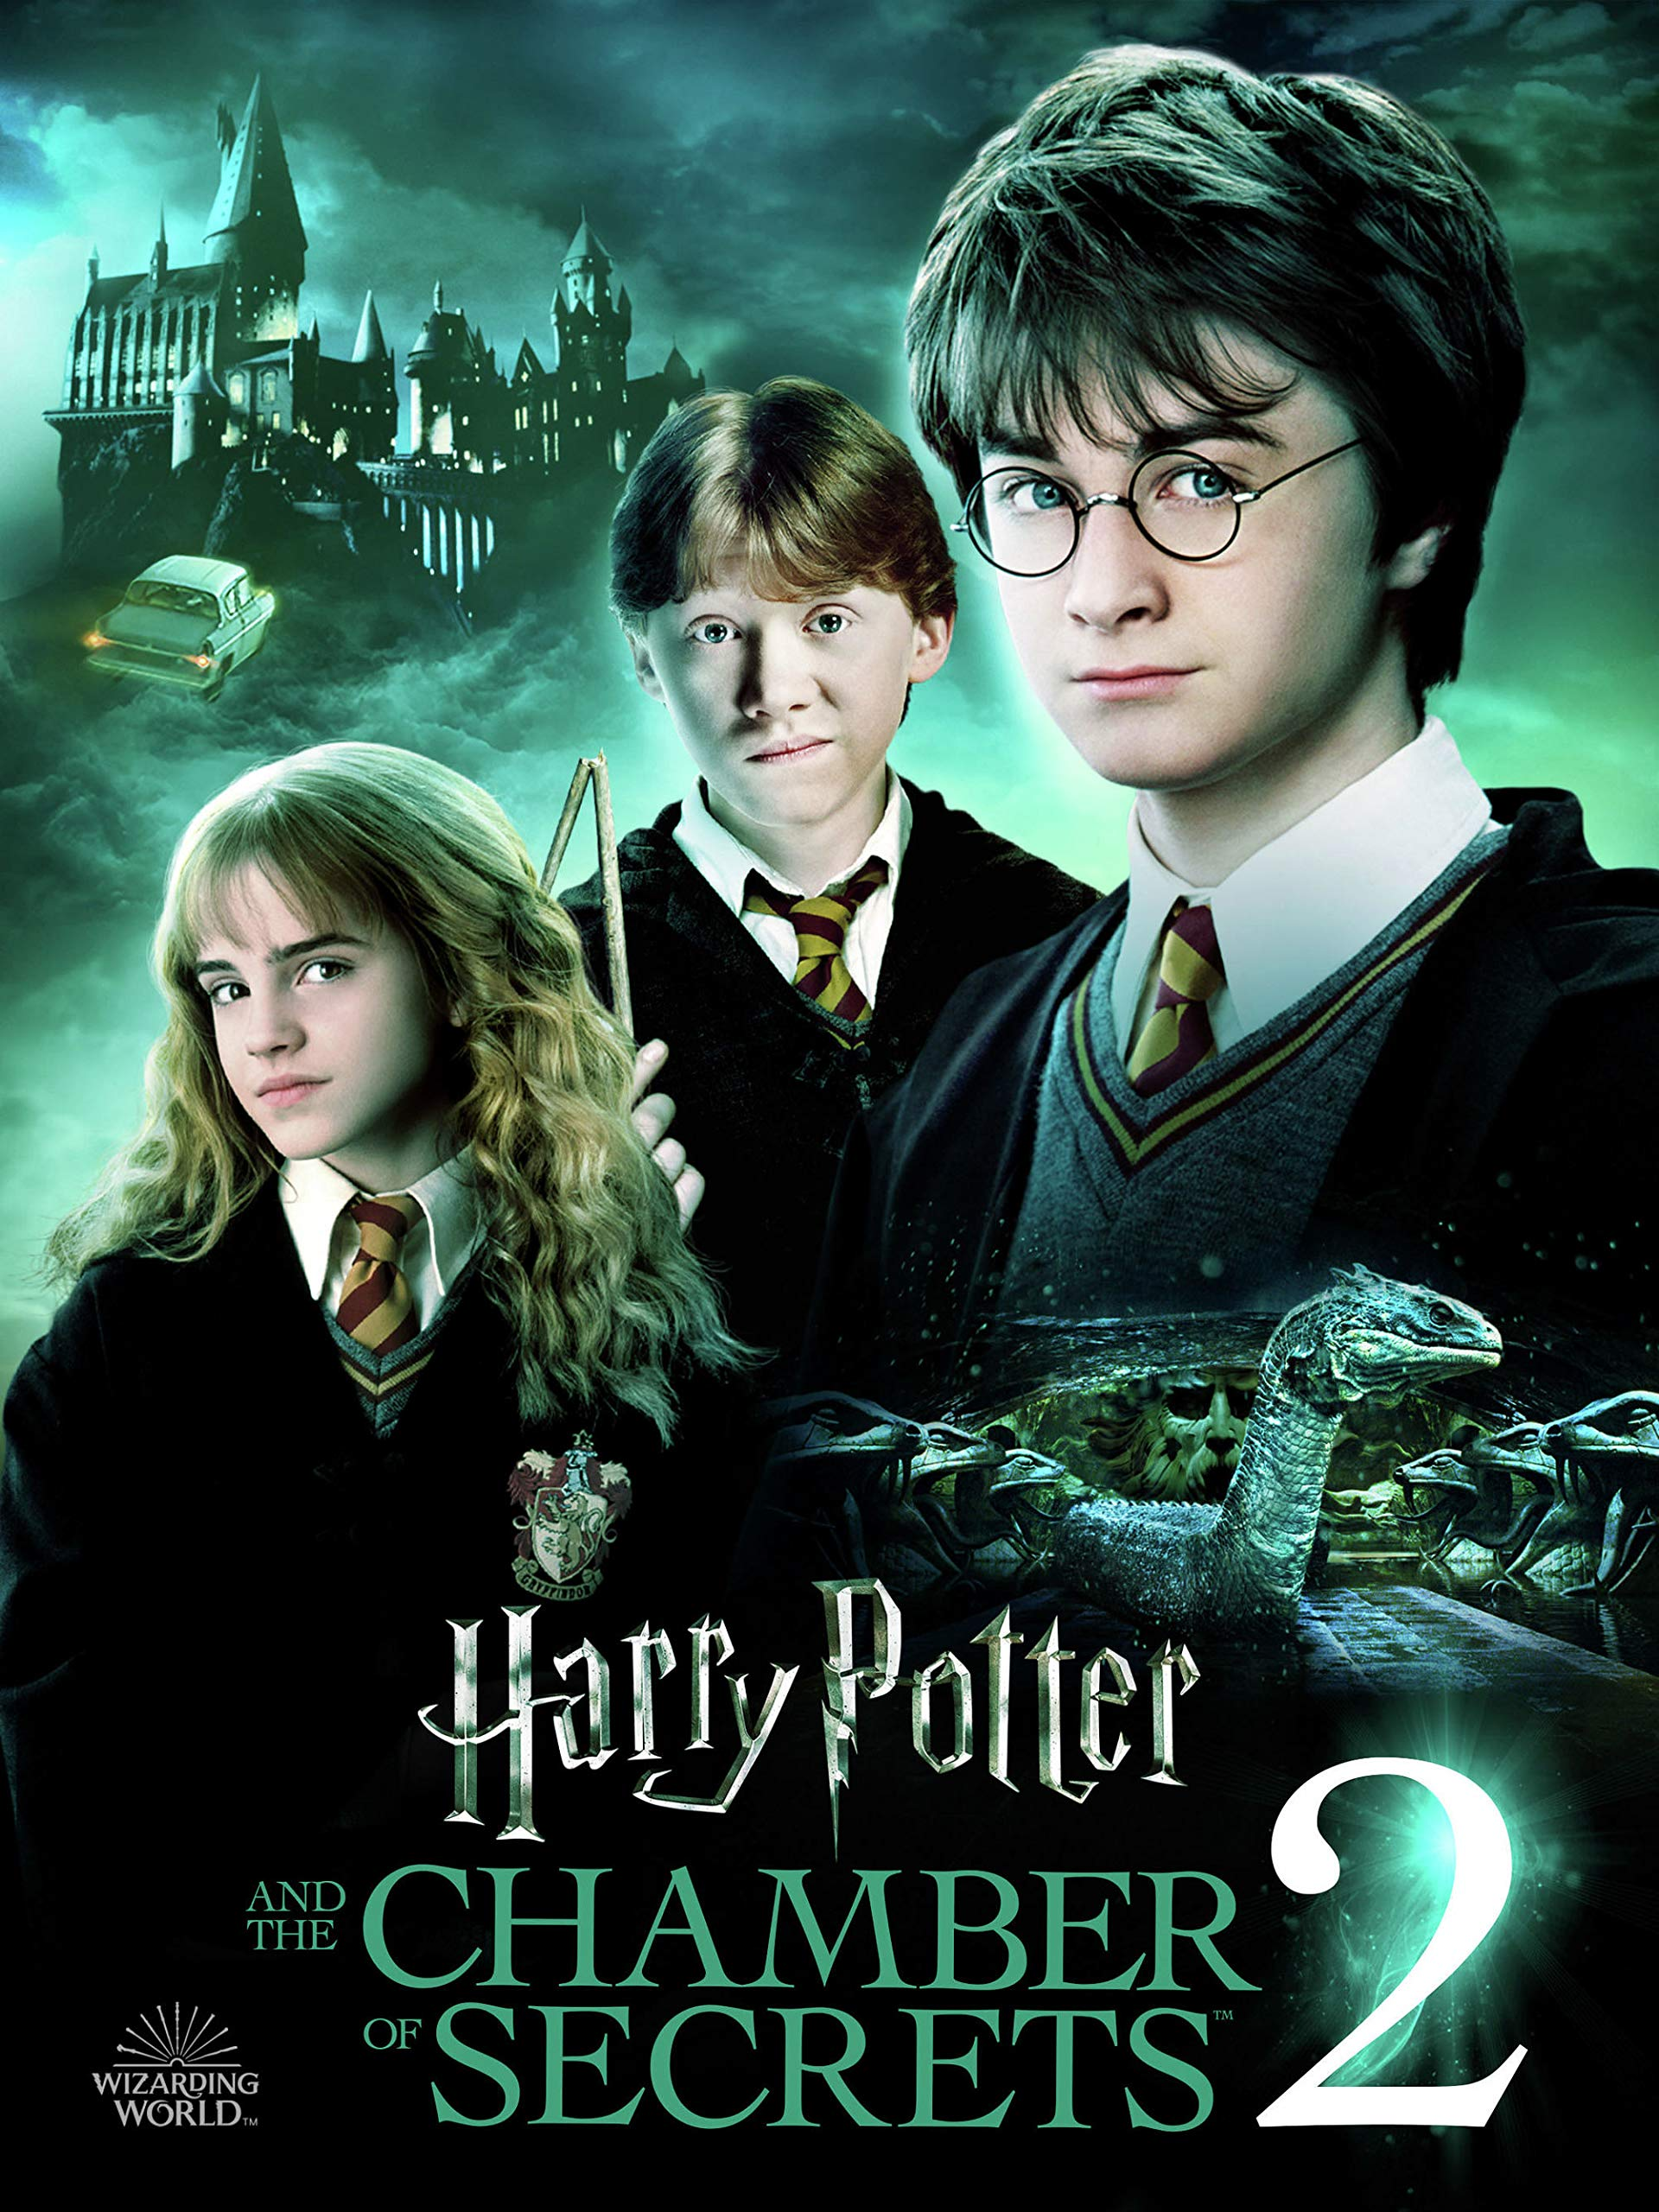 watch harry potter 4 online free